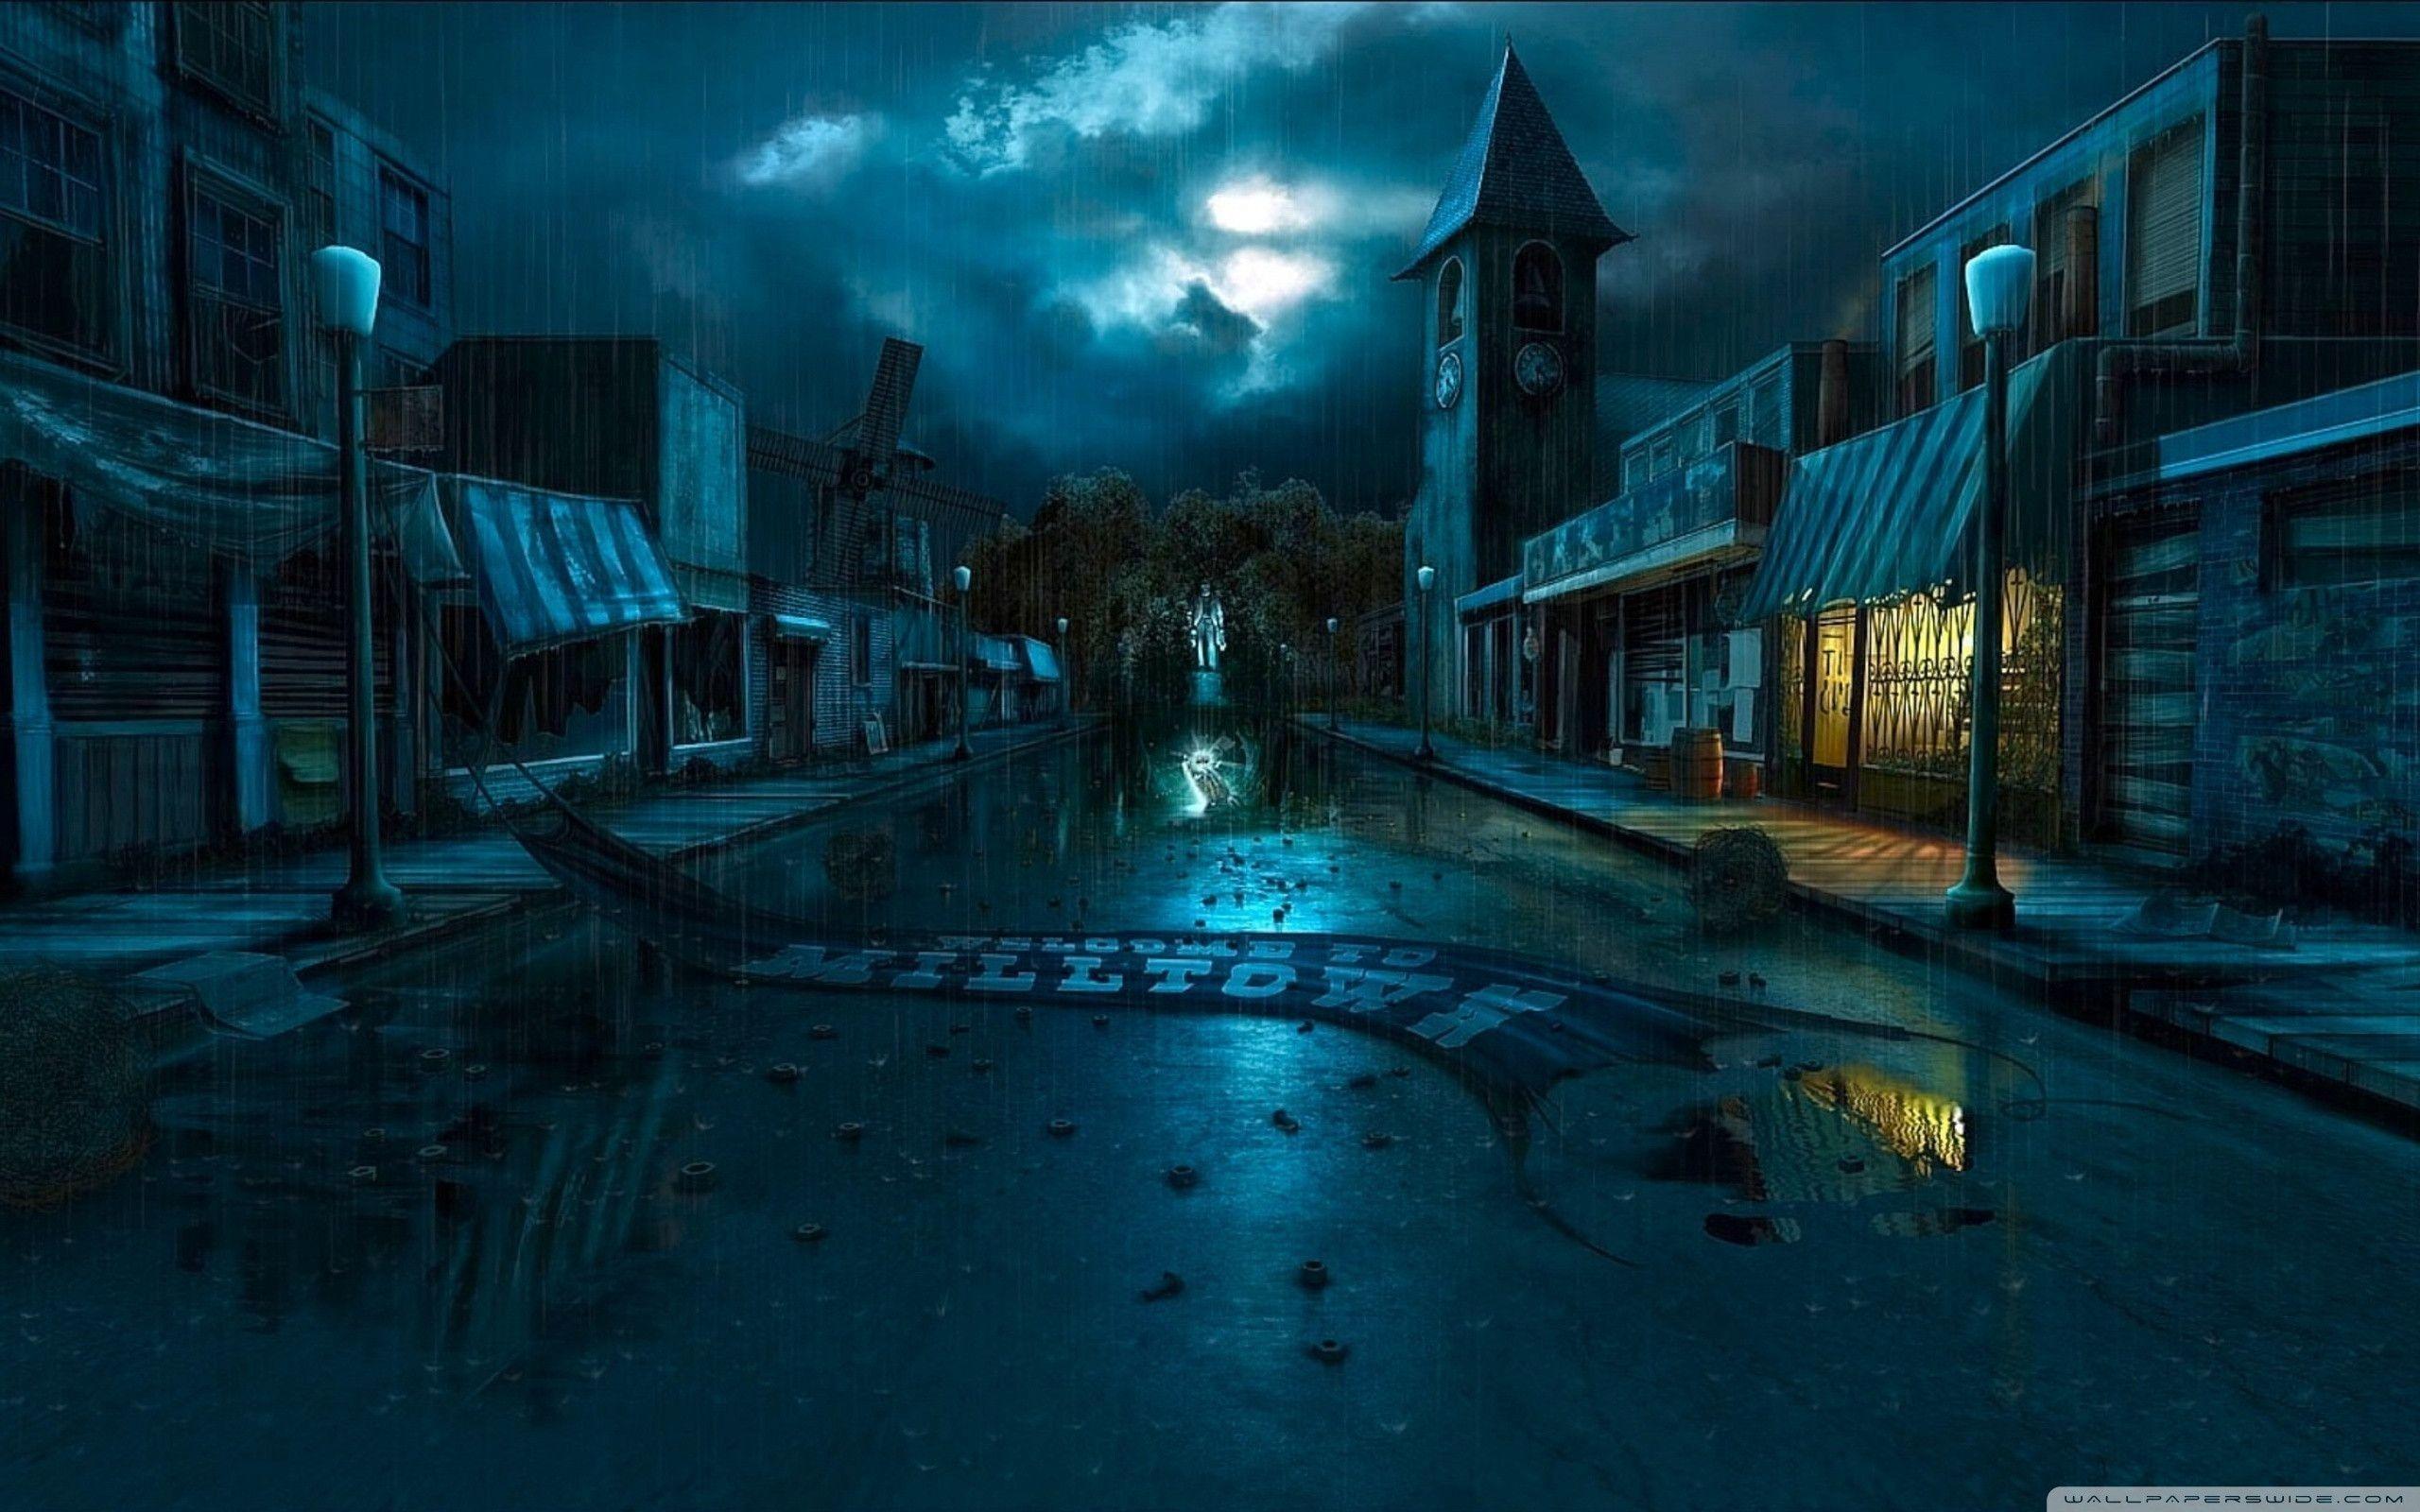 dark city street background 9828 | background check all